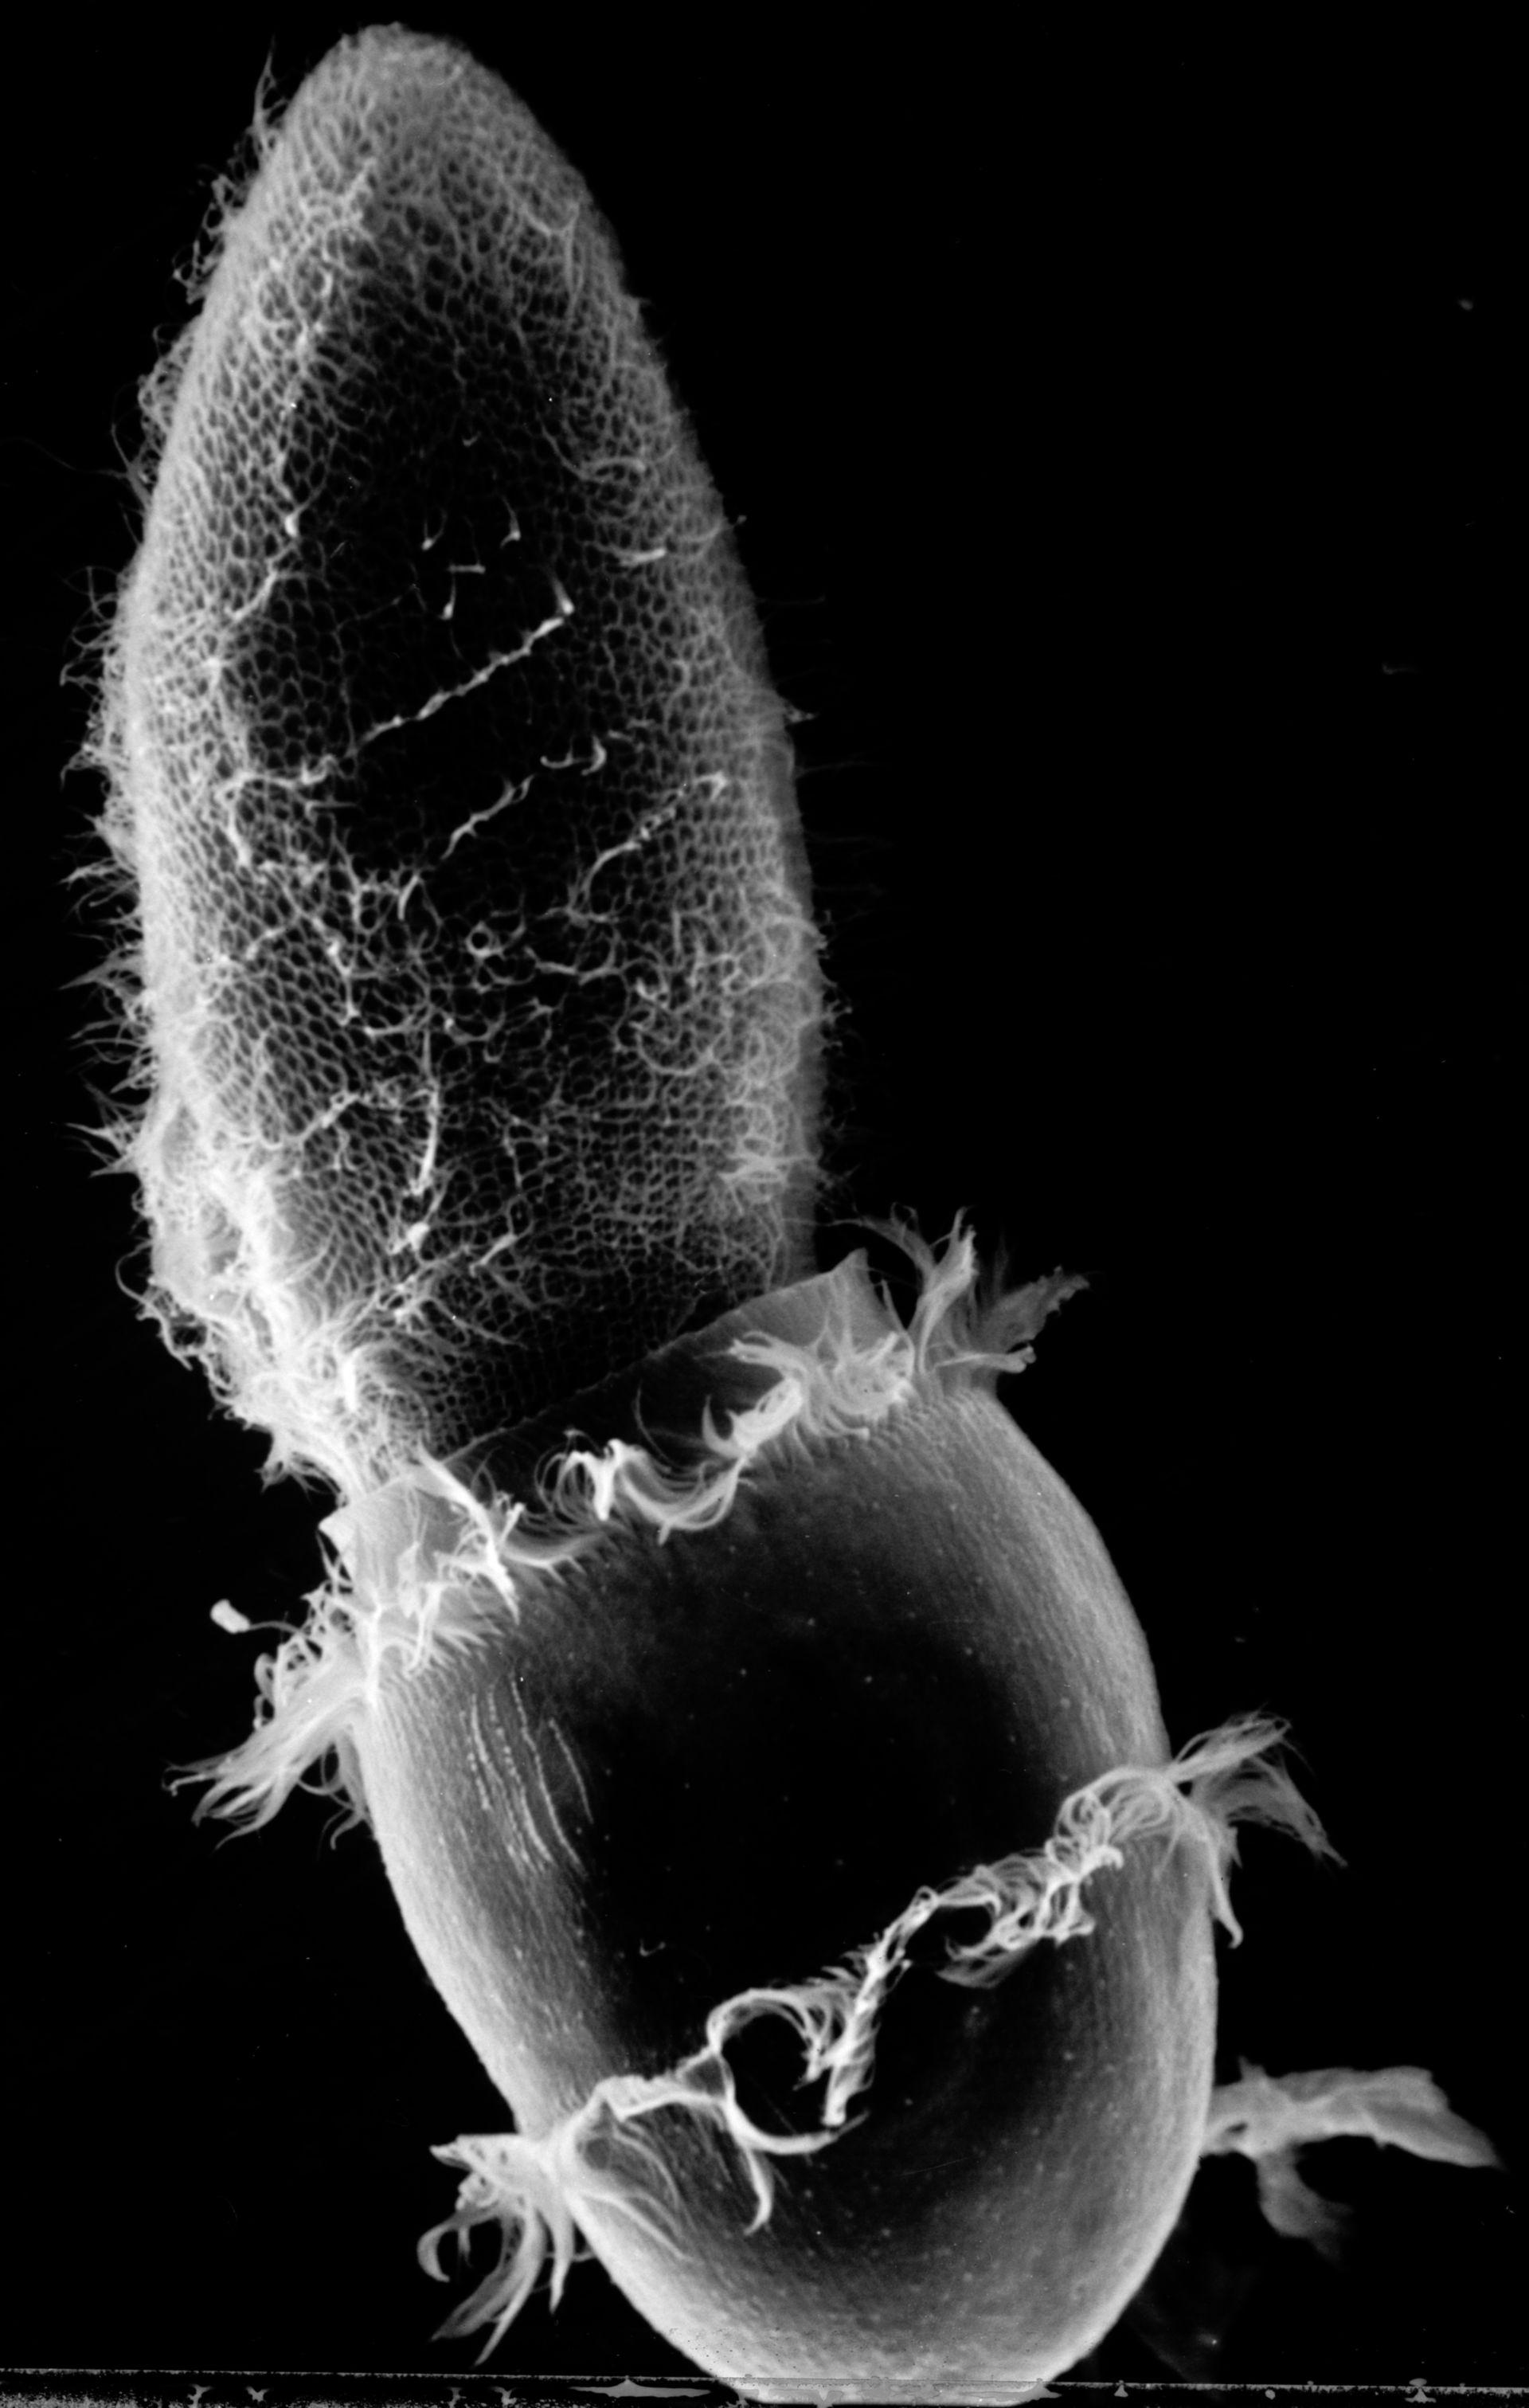 Paramecium sp. (Cell surface) - CIL:17891